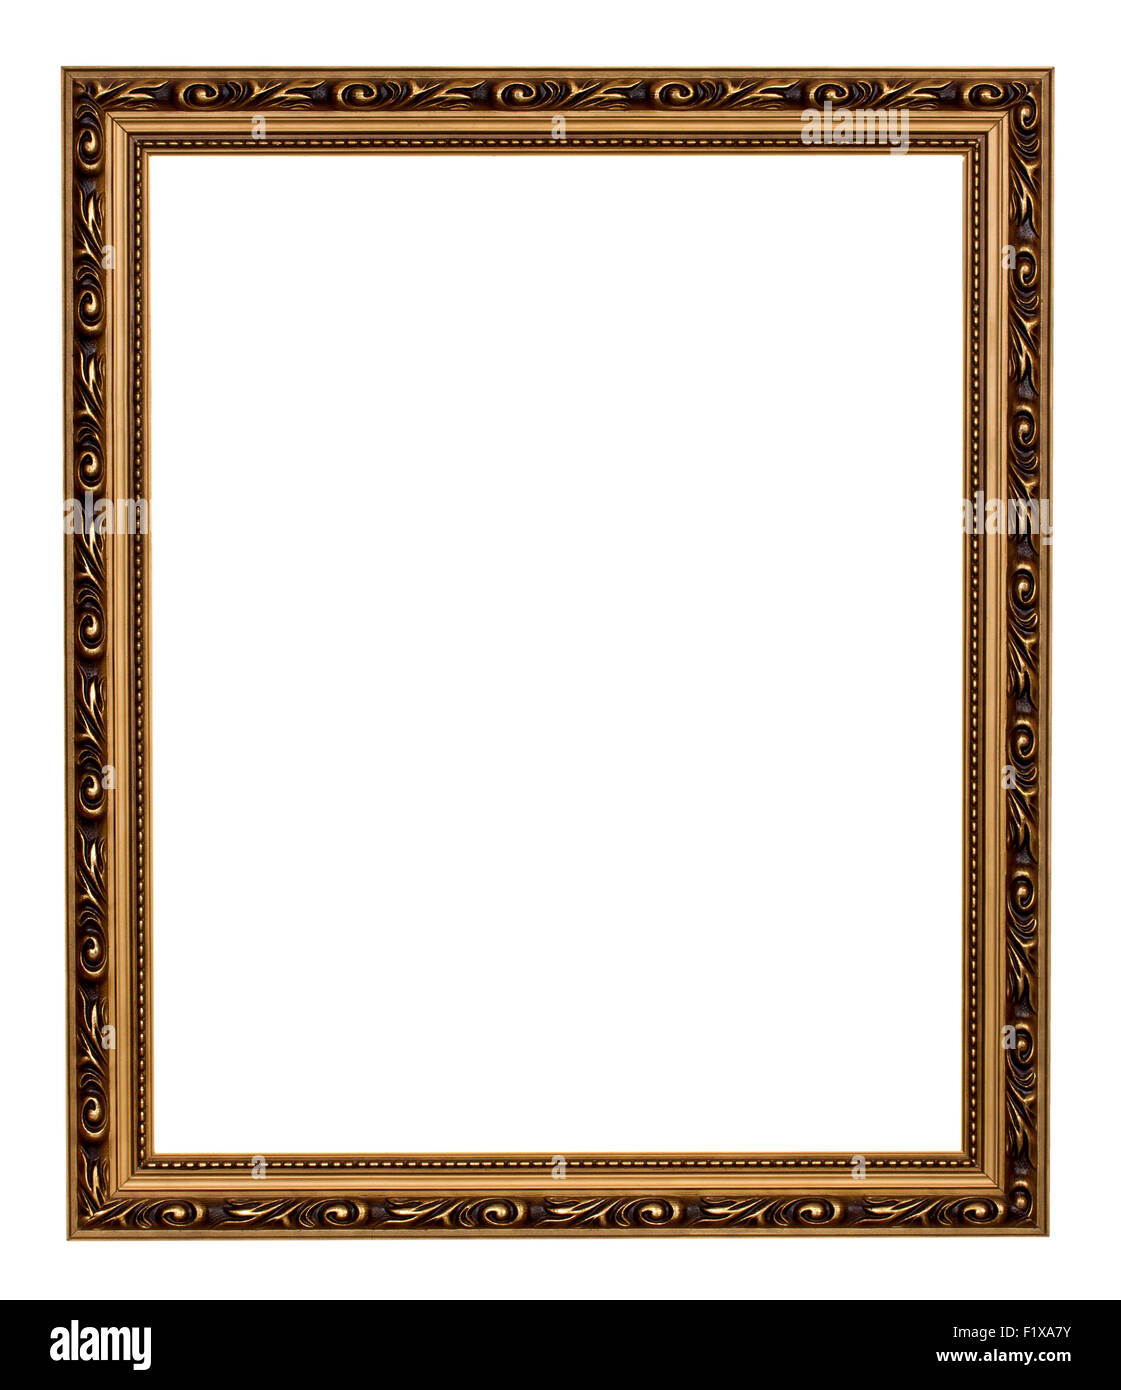 vintage frame isolated on the white background. - Stock Image